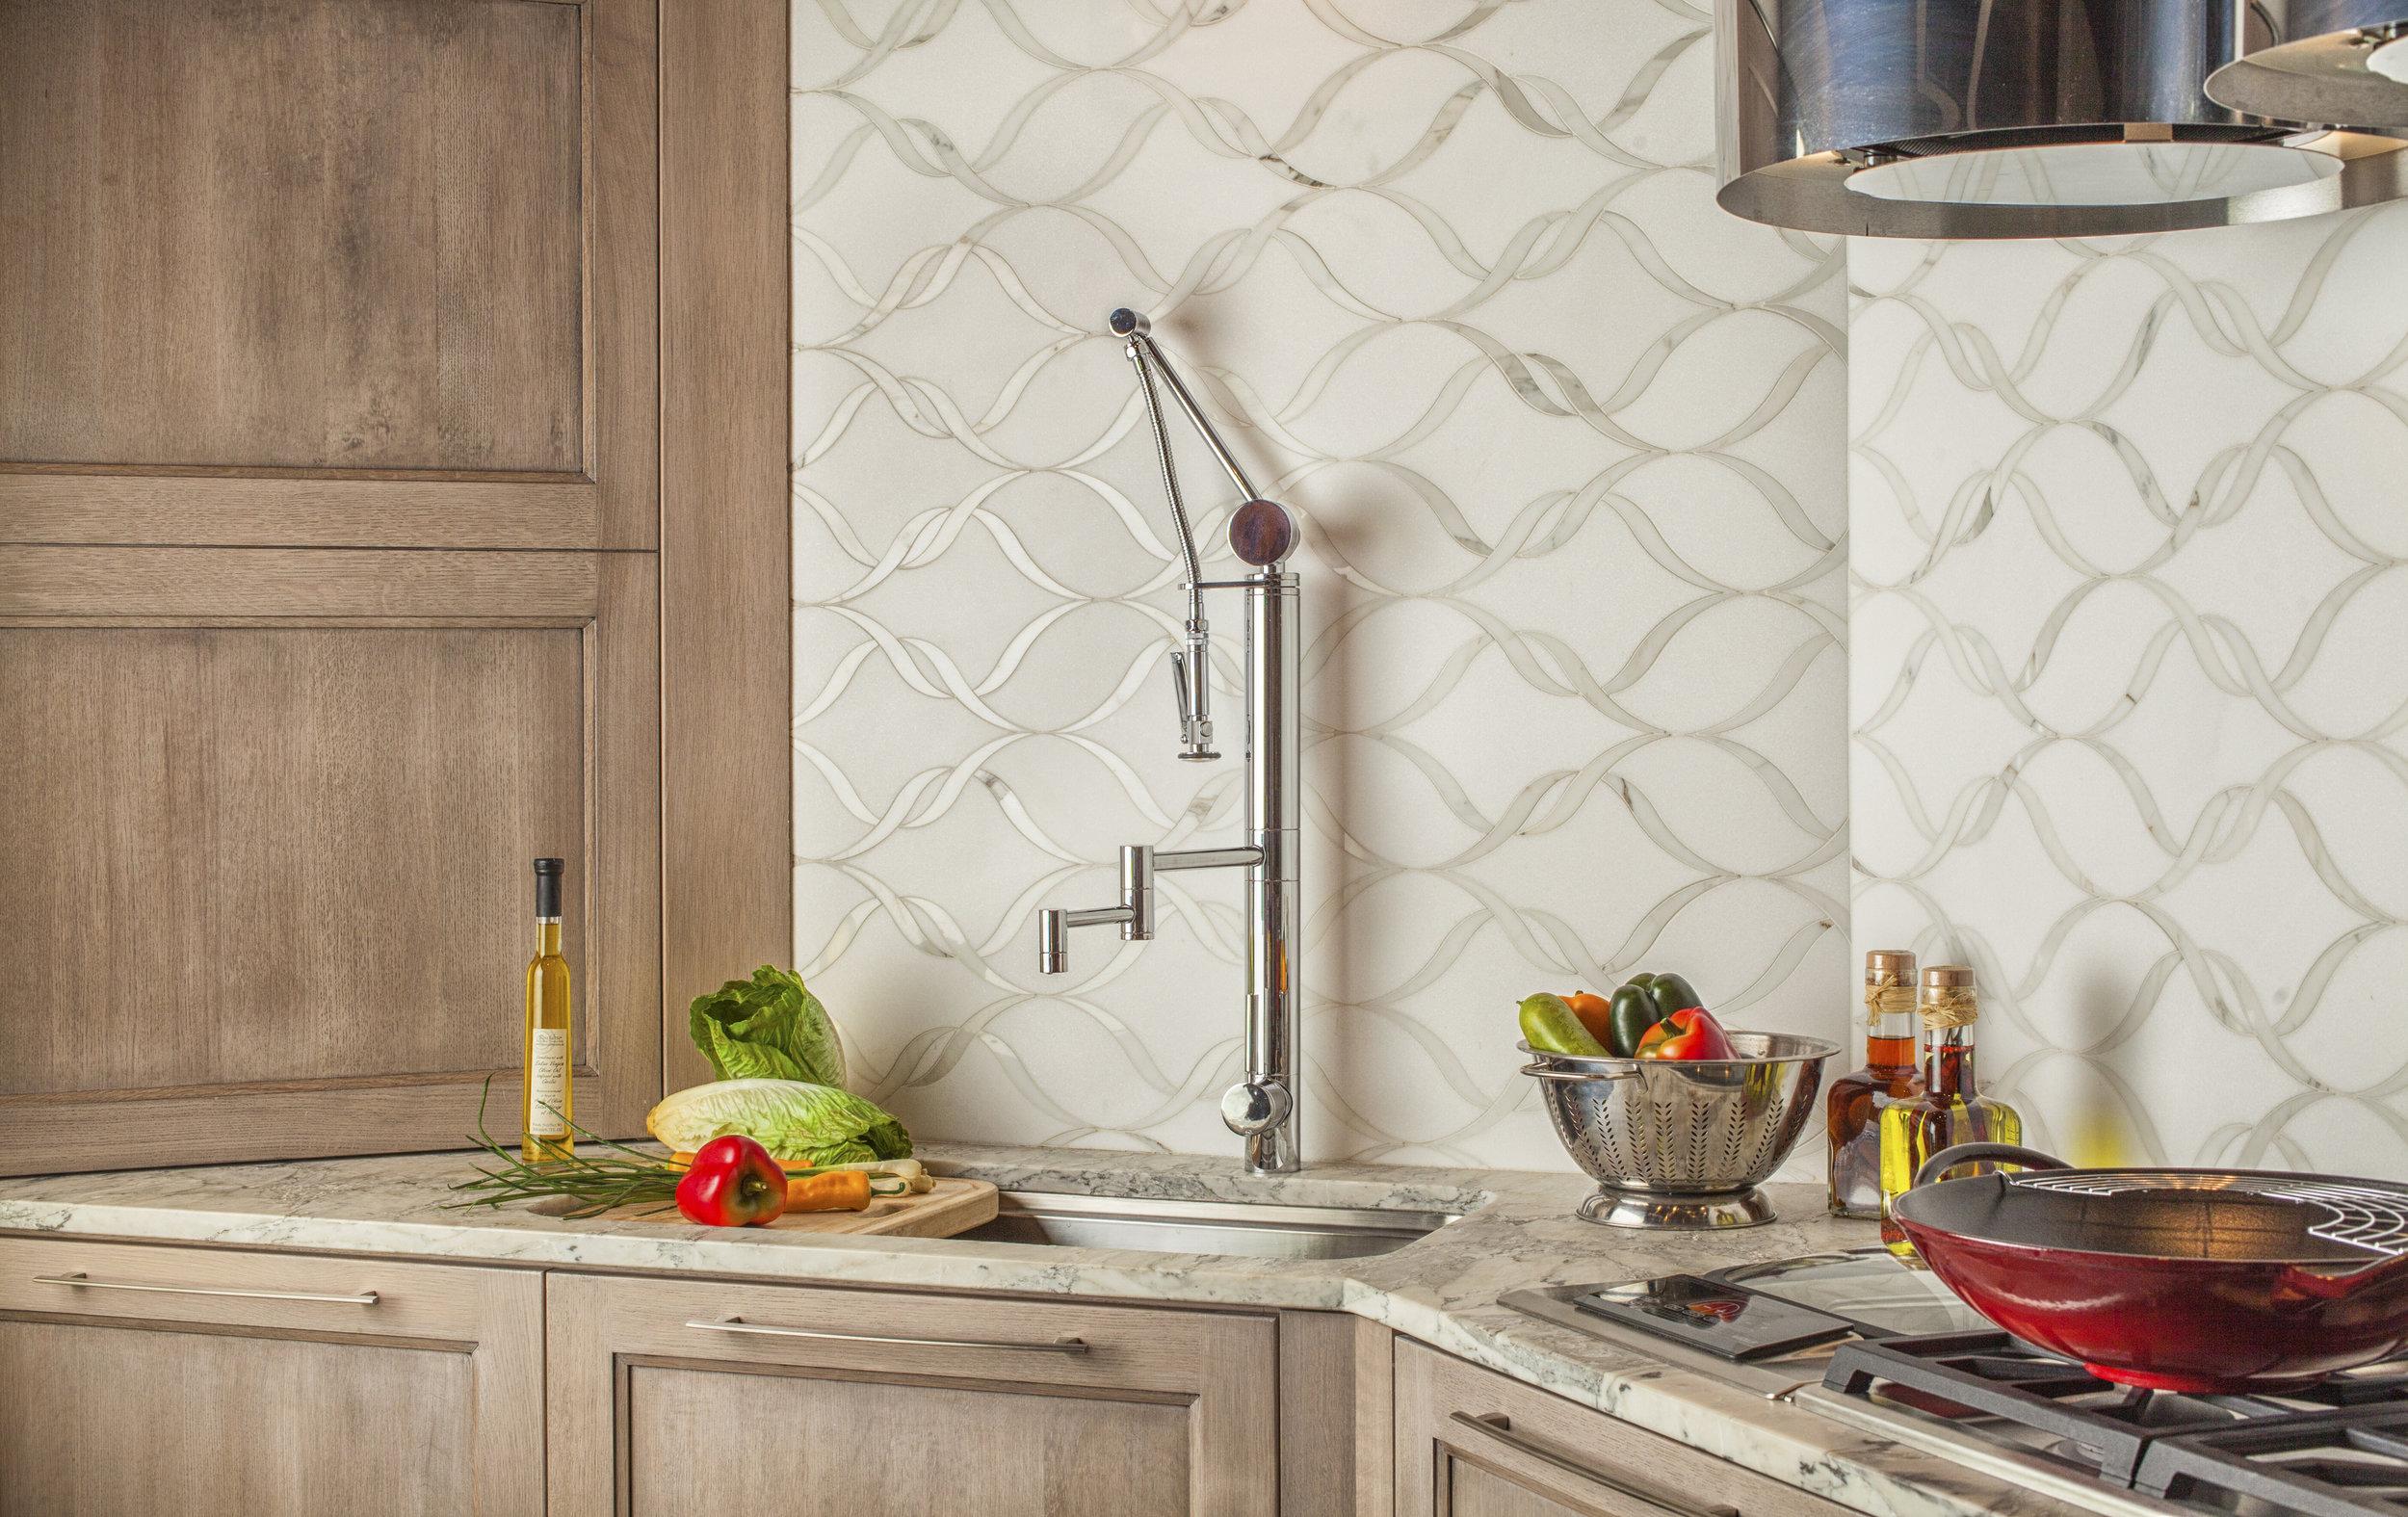 Waterstone-Cont-Gantry-Faucet1.jpg